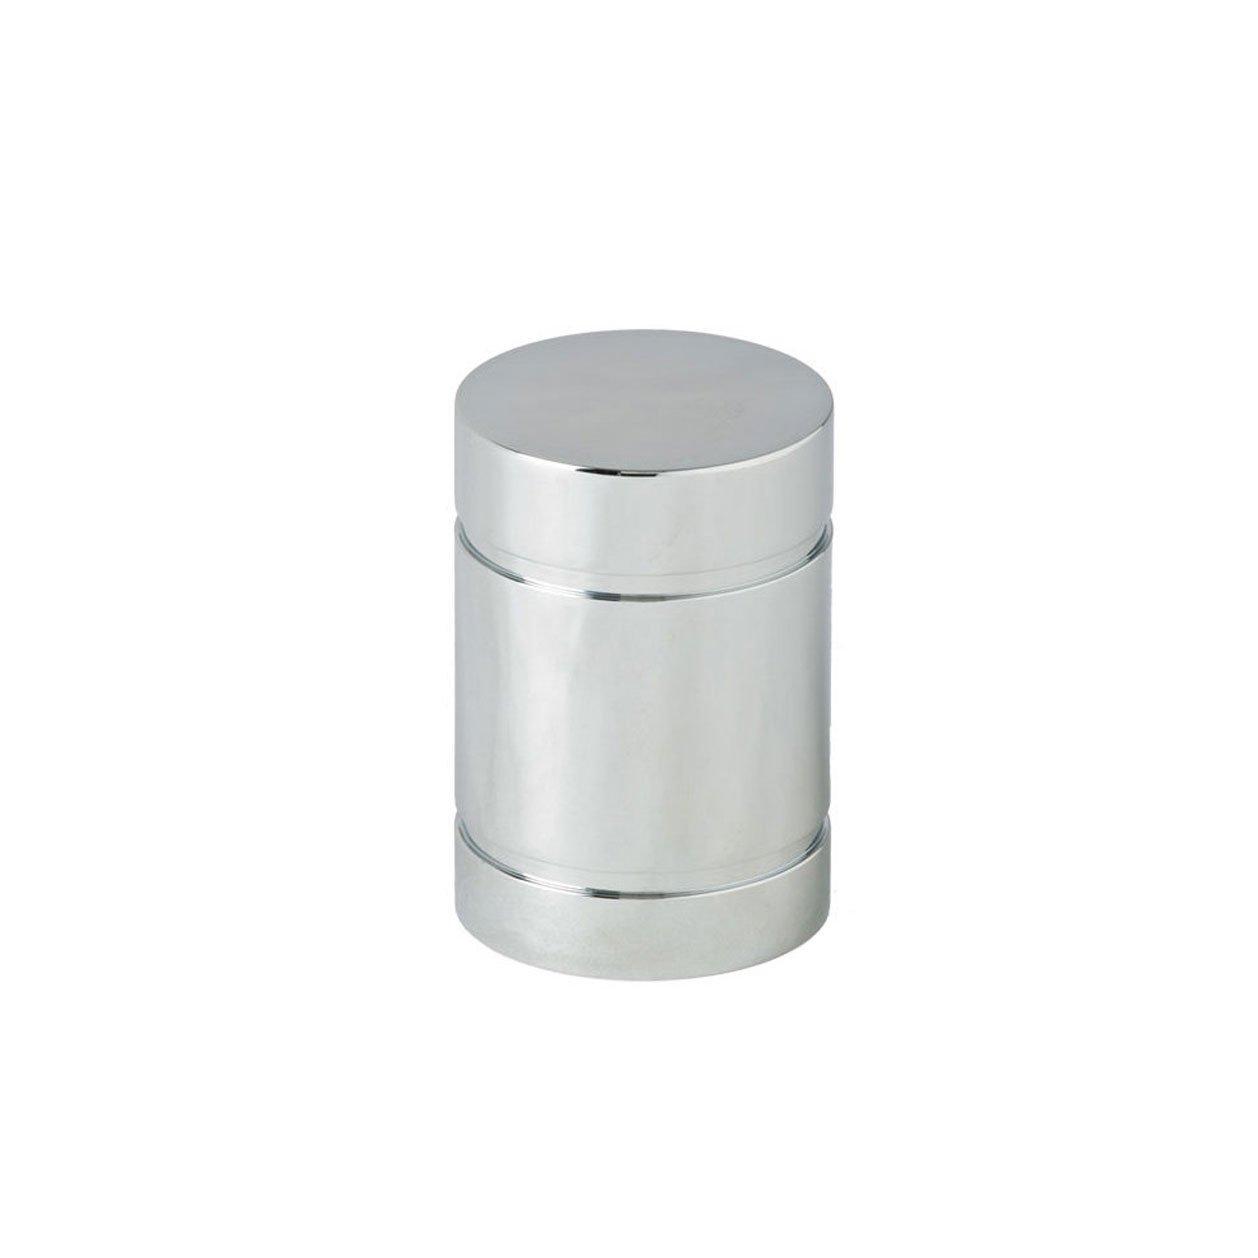 Waterstone 3030-SN Contemporary Air Gap Dual Port, Satin Nickel